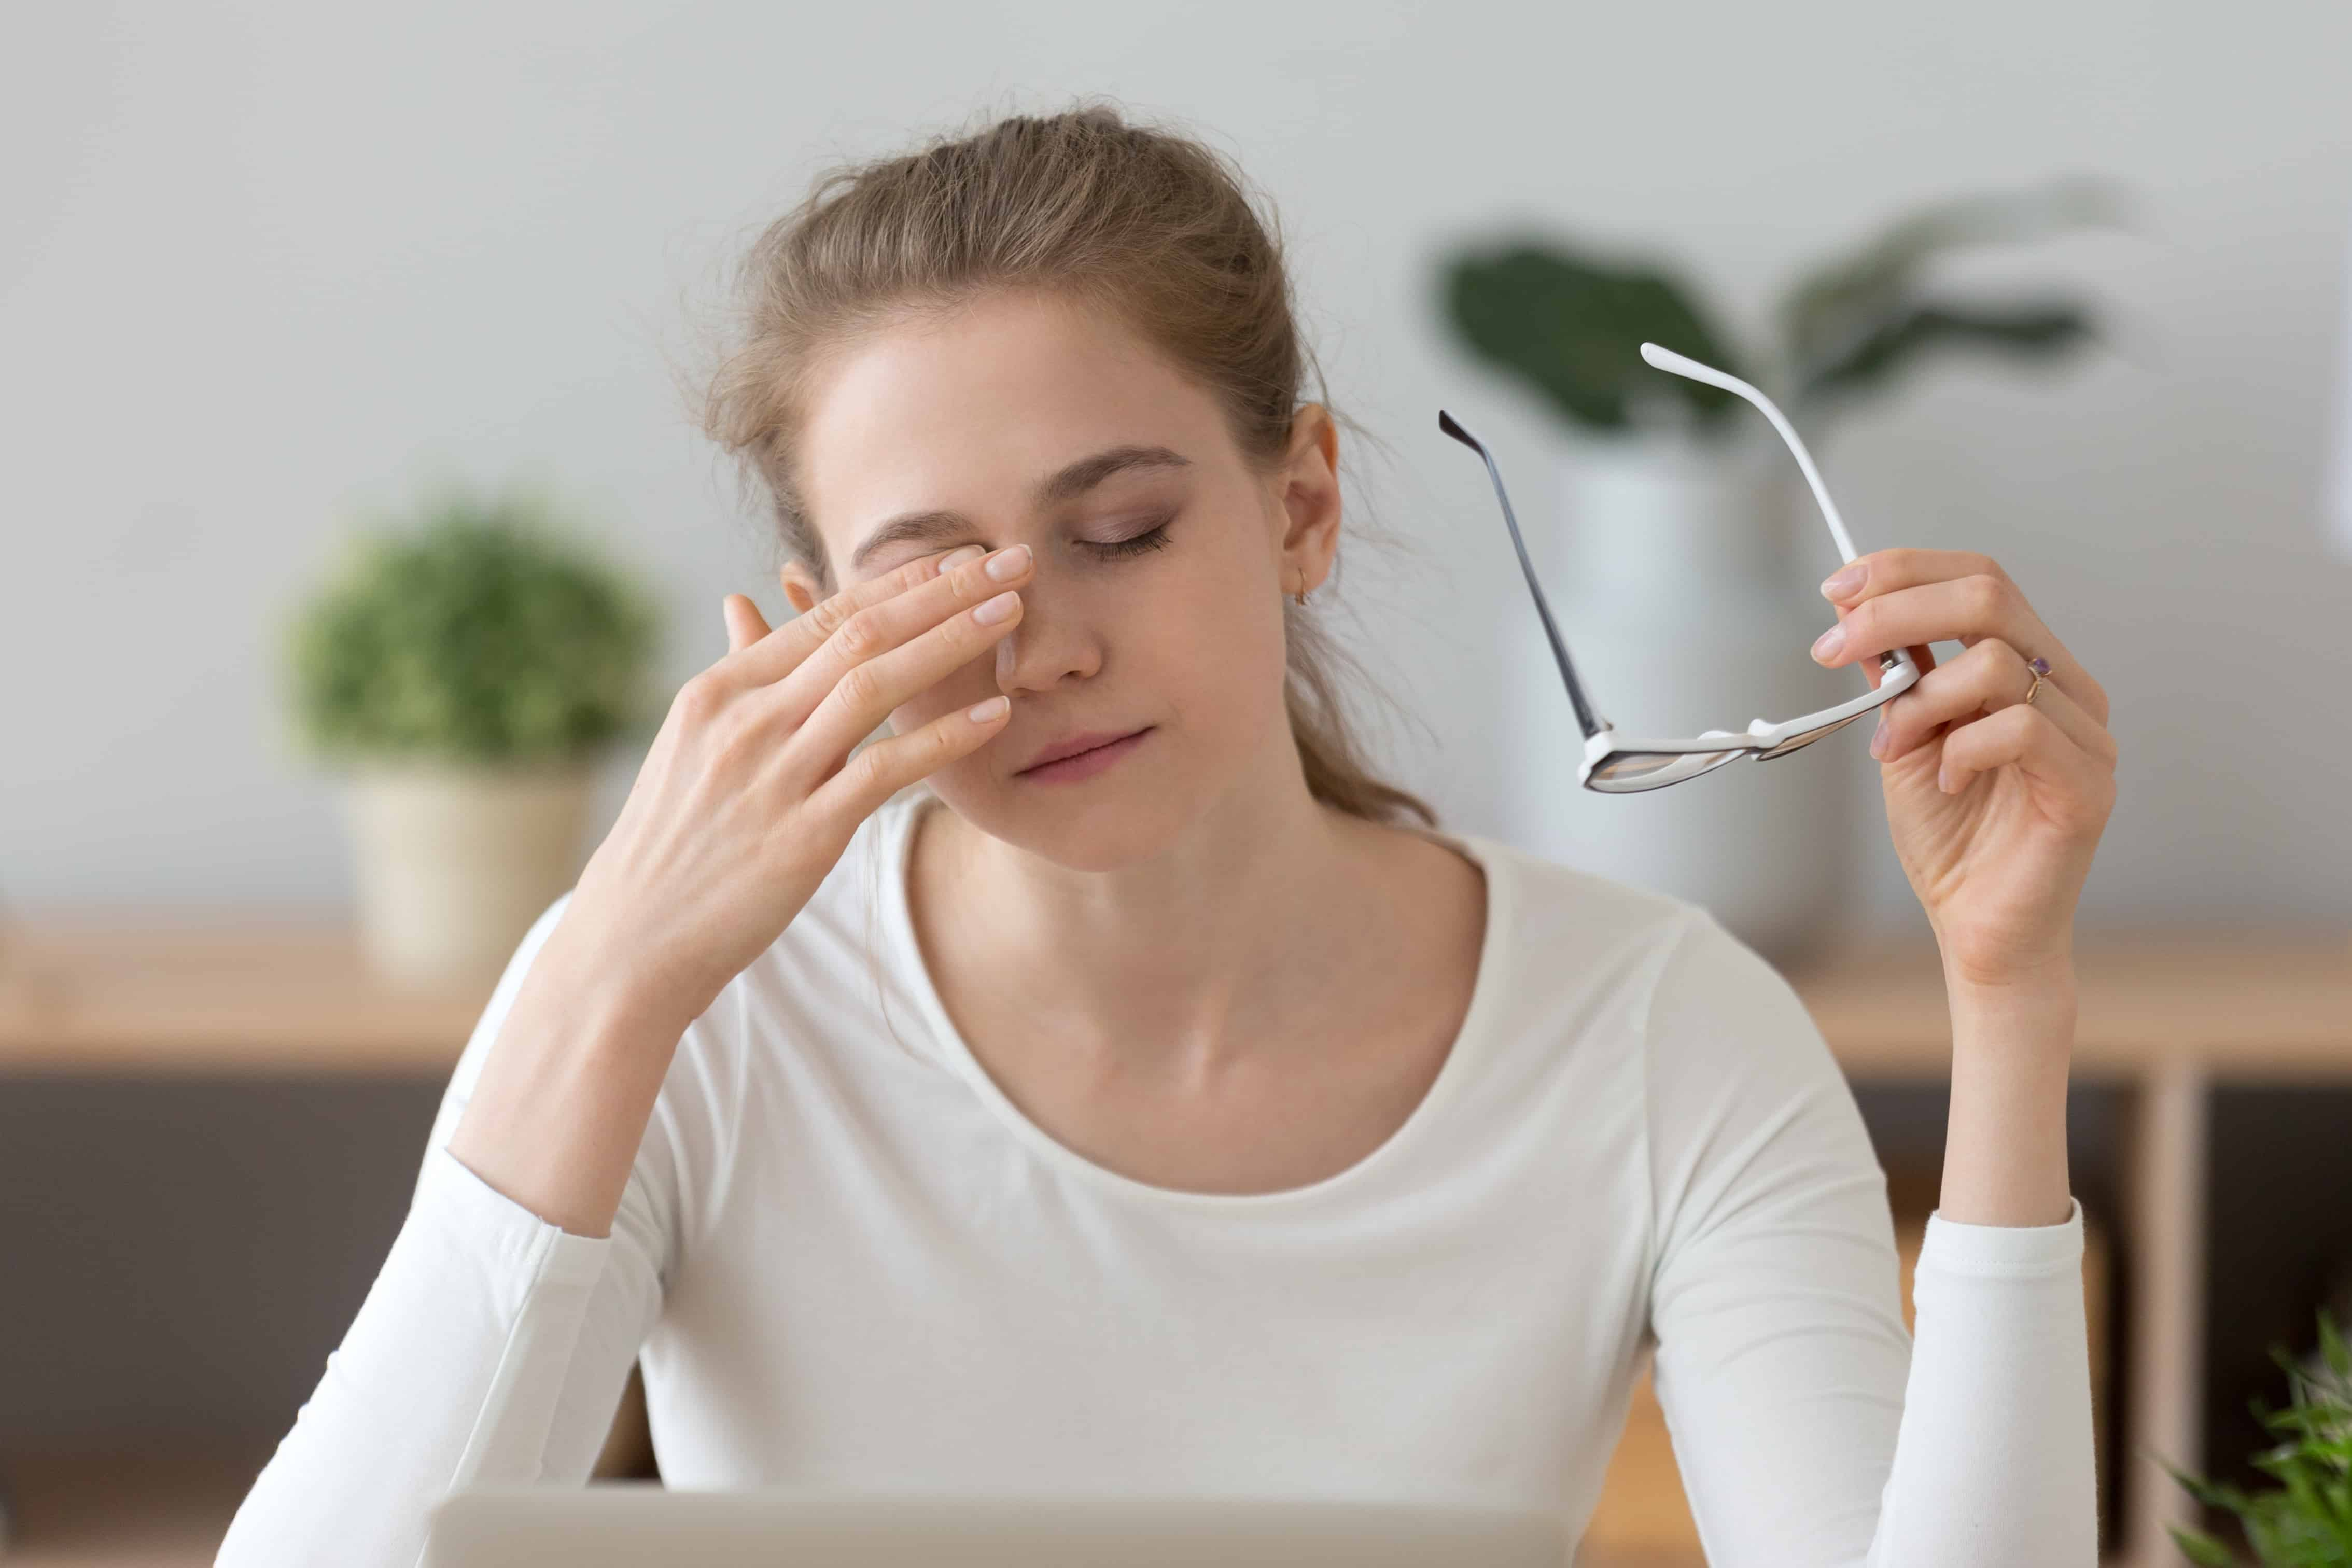 Fatigued girl taking off glasses rubbing eyes feeling eye strain